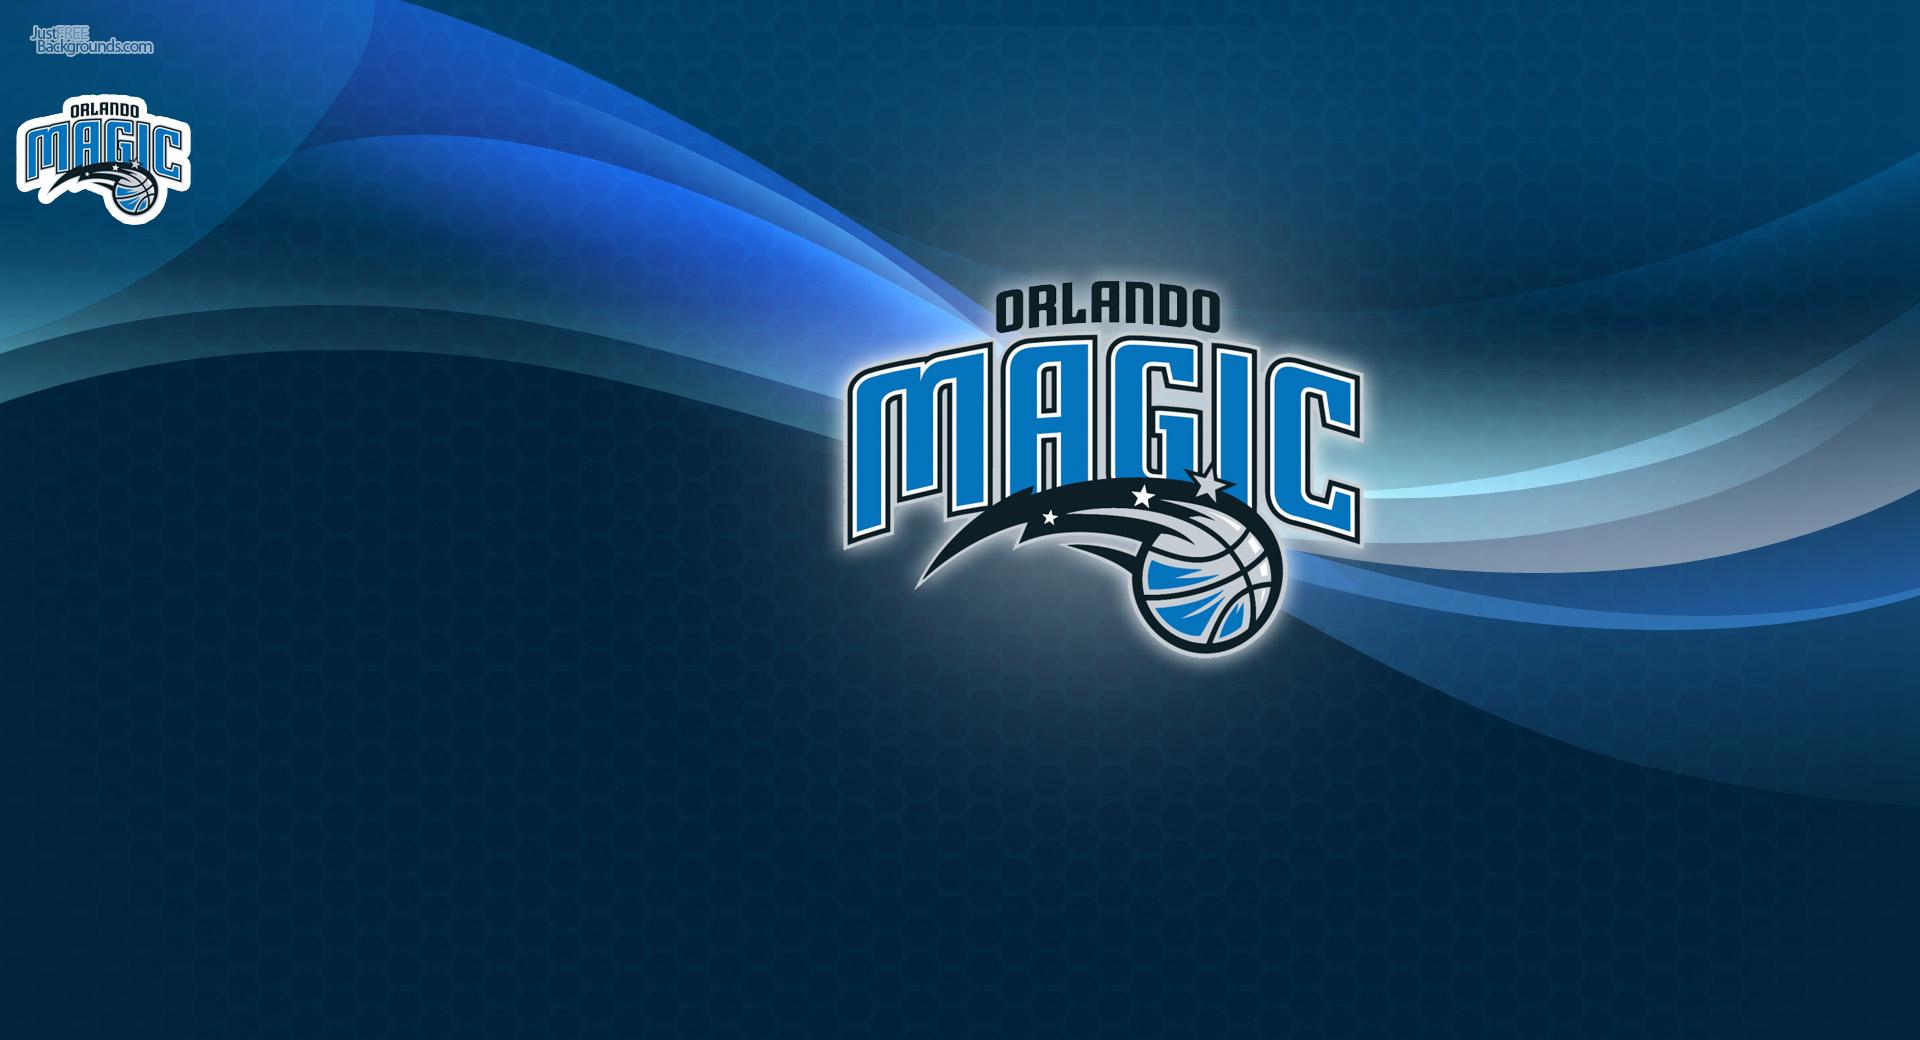 ORLANDO MAGIC nba basketball g wallpaper background 1920x1040